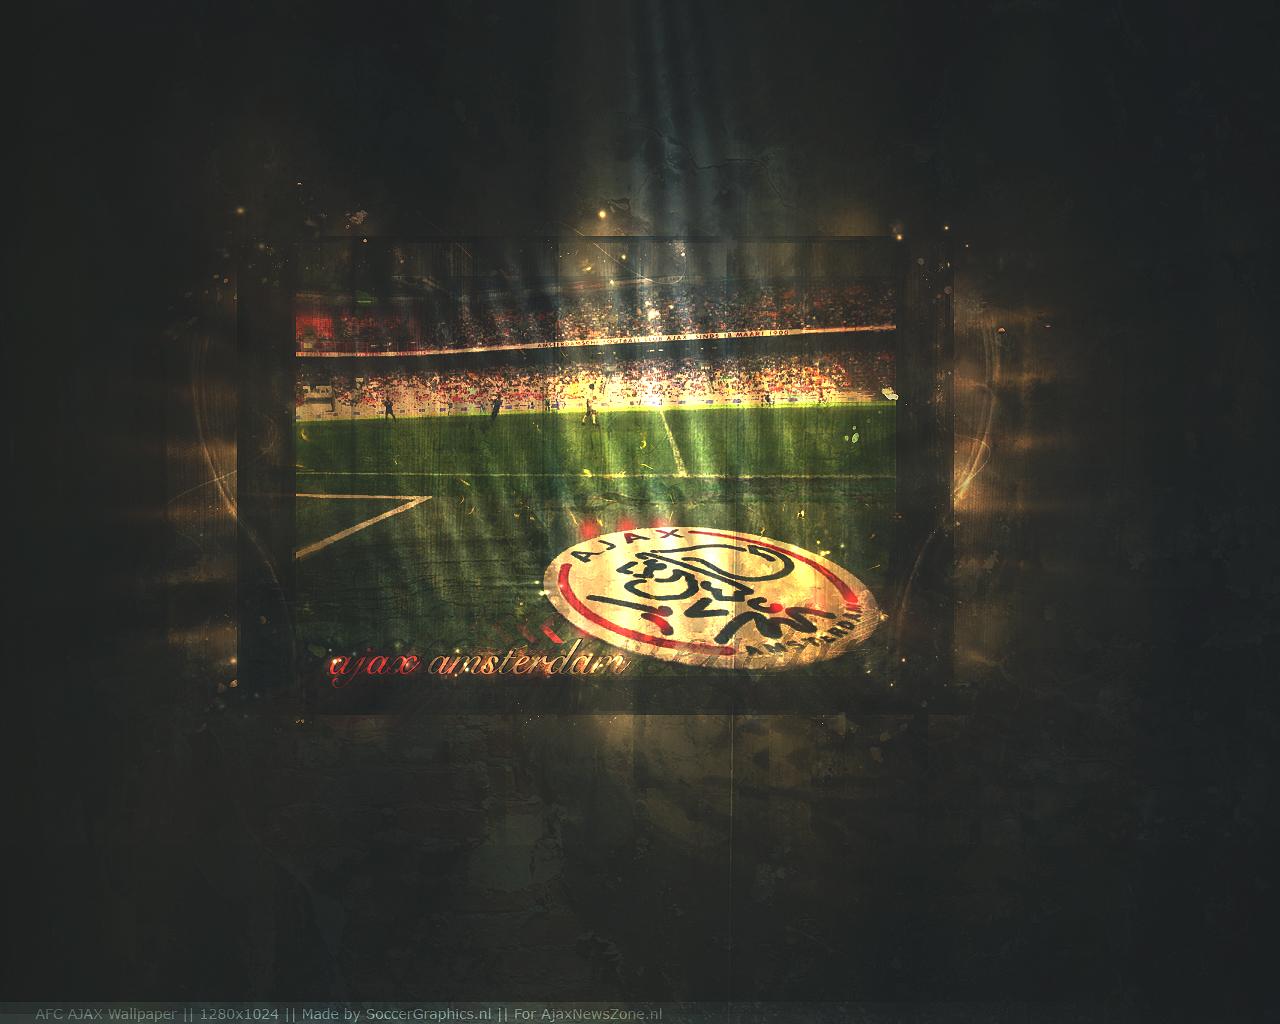 http://4.bp.blogspot.com/_oJpV6yalpOk/TRHNF78WXlI/AAAAAAAABQU/b4PZ0c9nMYs/s1600/Ajax-achtergronden-ajax-wallpapers-7.jpg